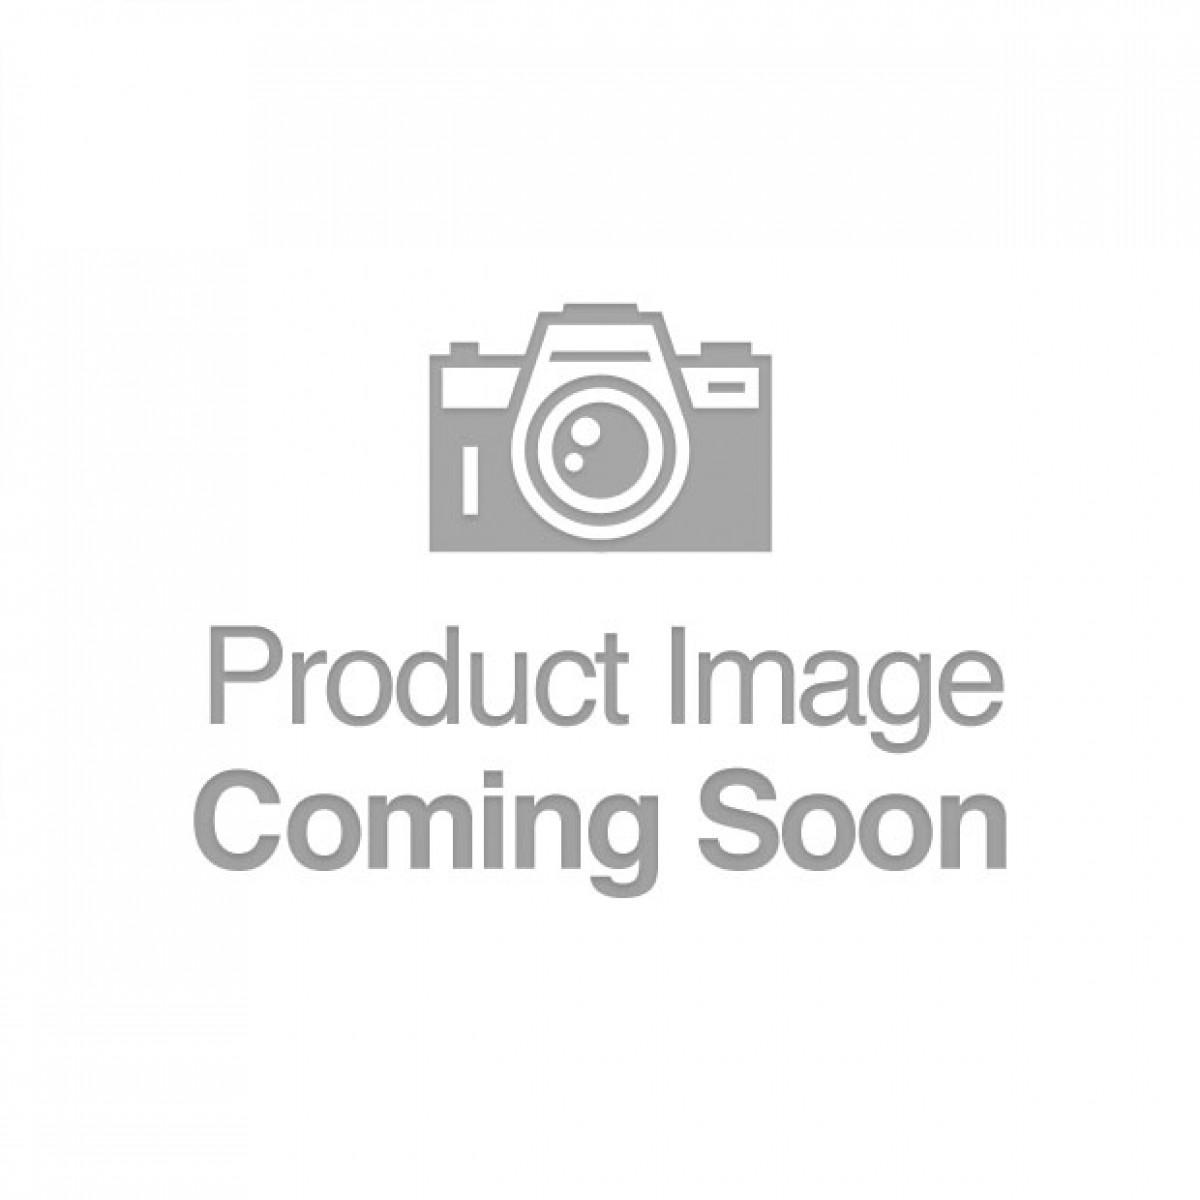 Curve Novelties Gossip G Spot Silicone Wand 50x - Violet